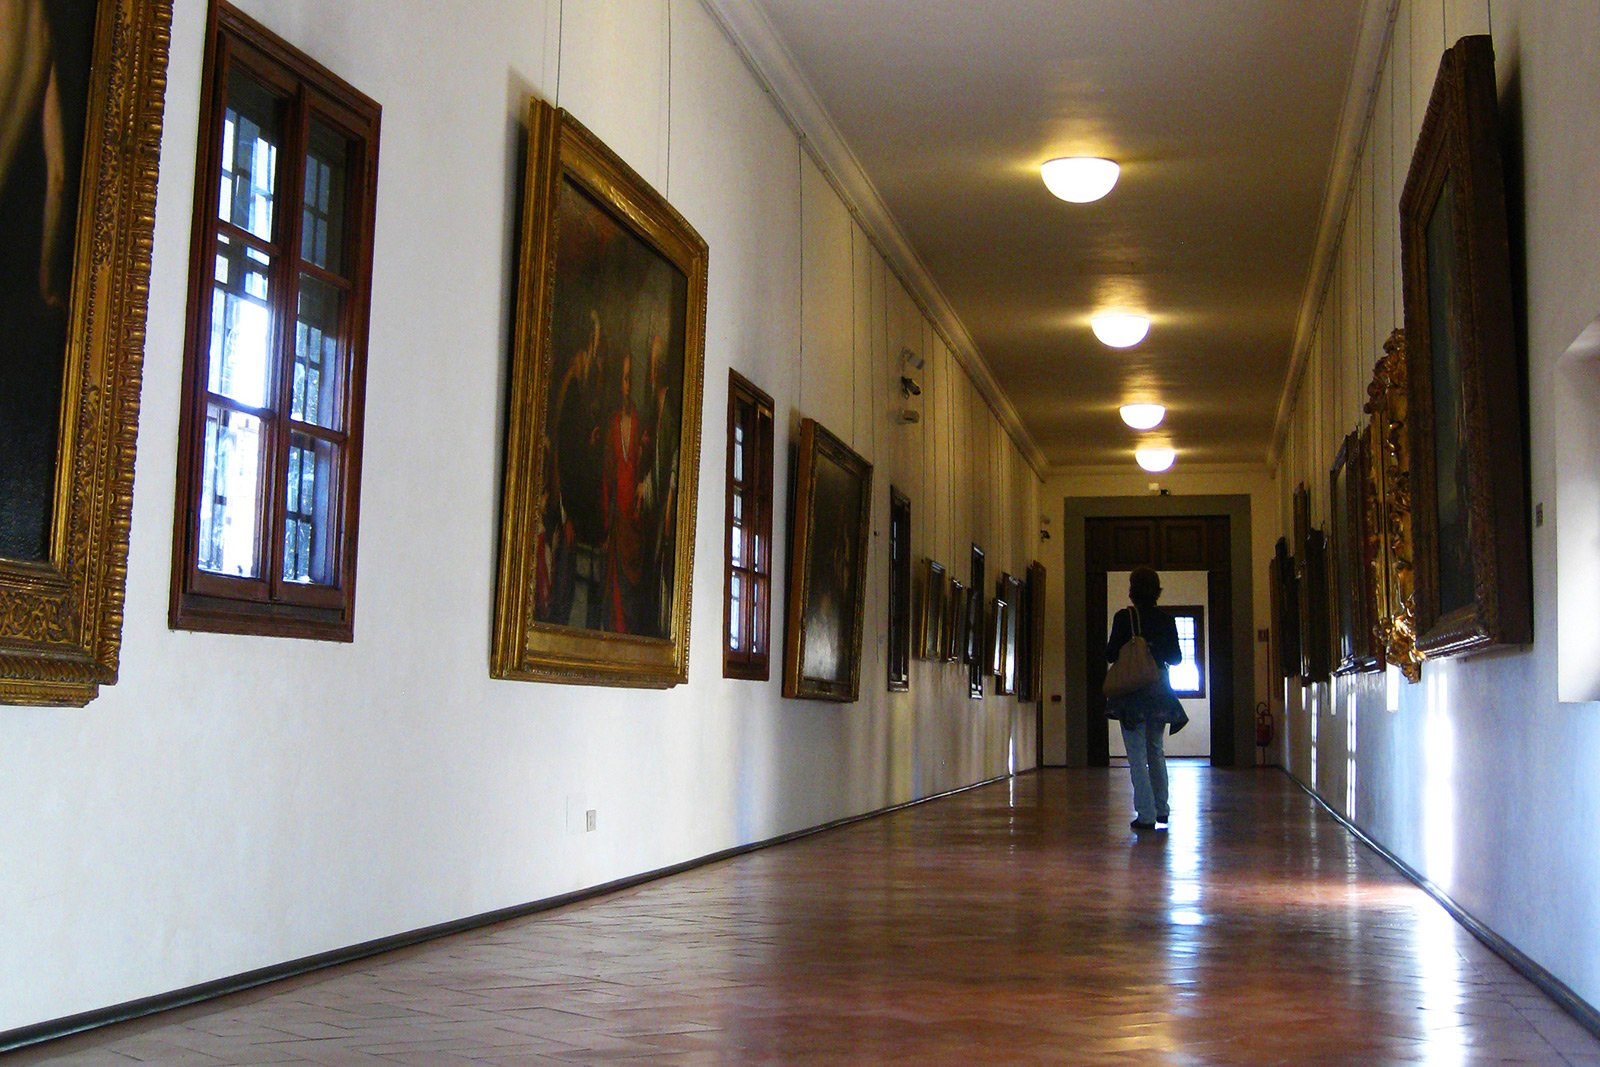 How to walk through the Vasari Corridor in Florence